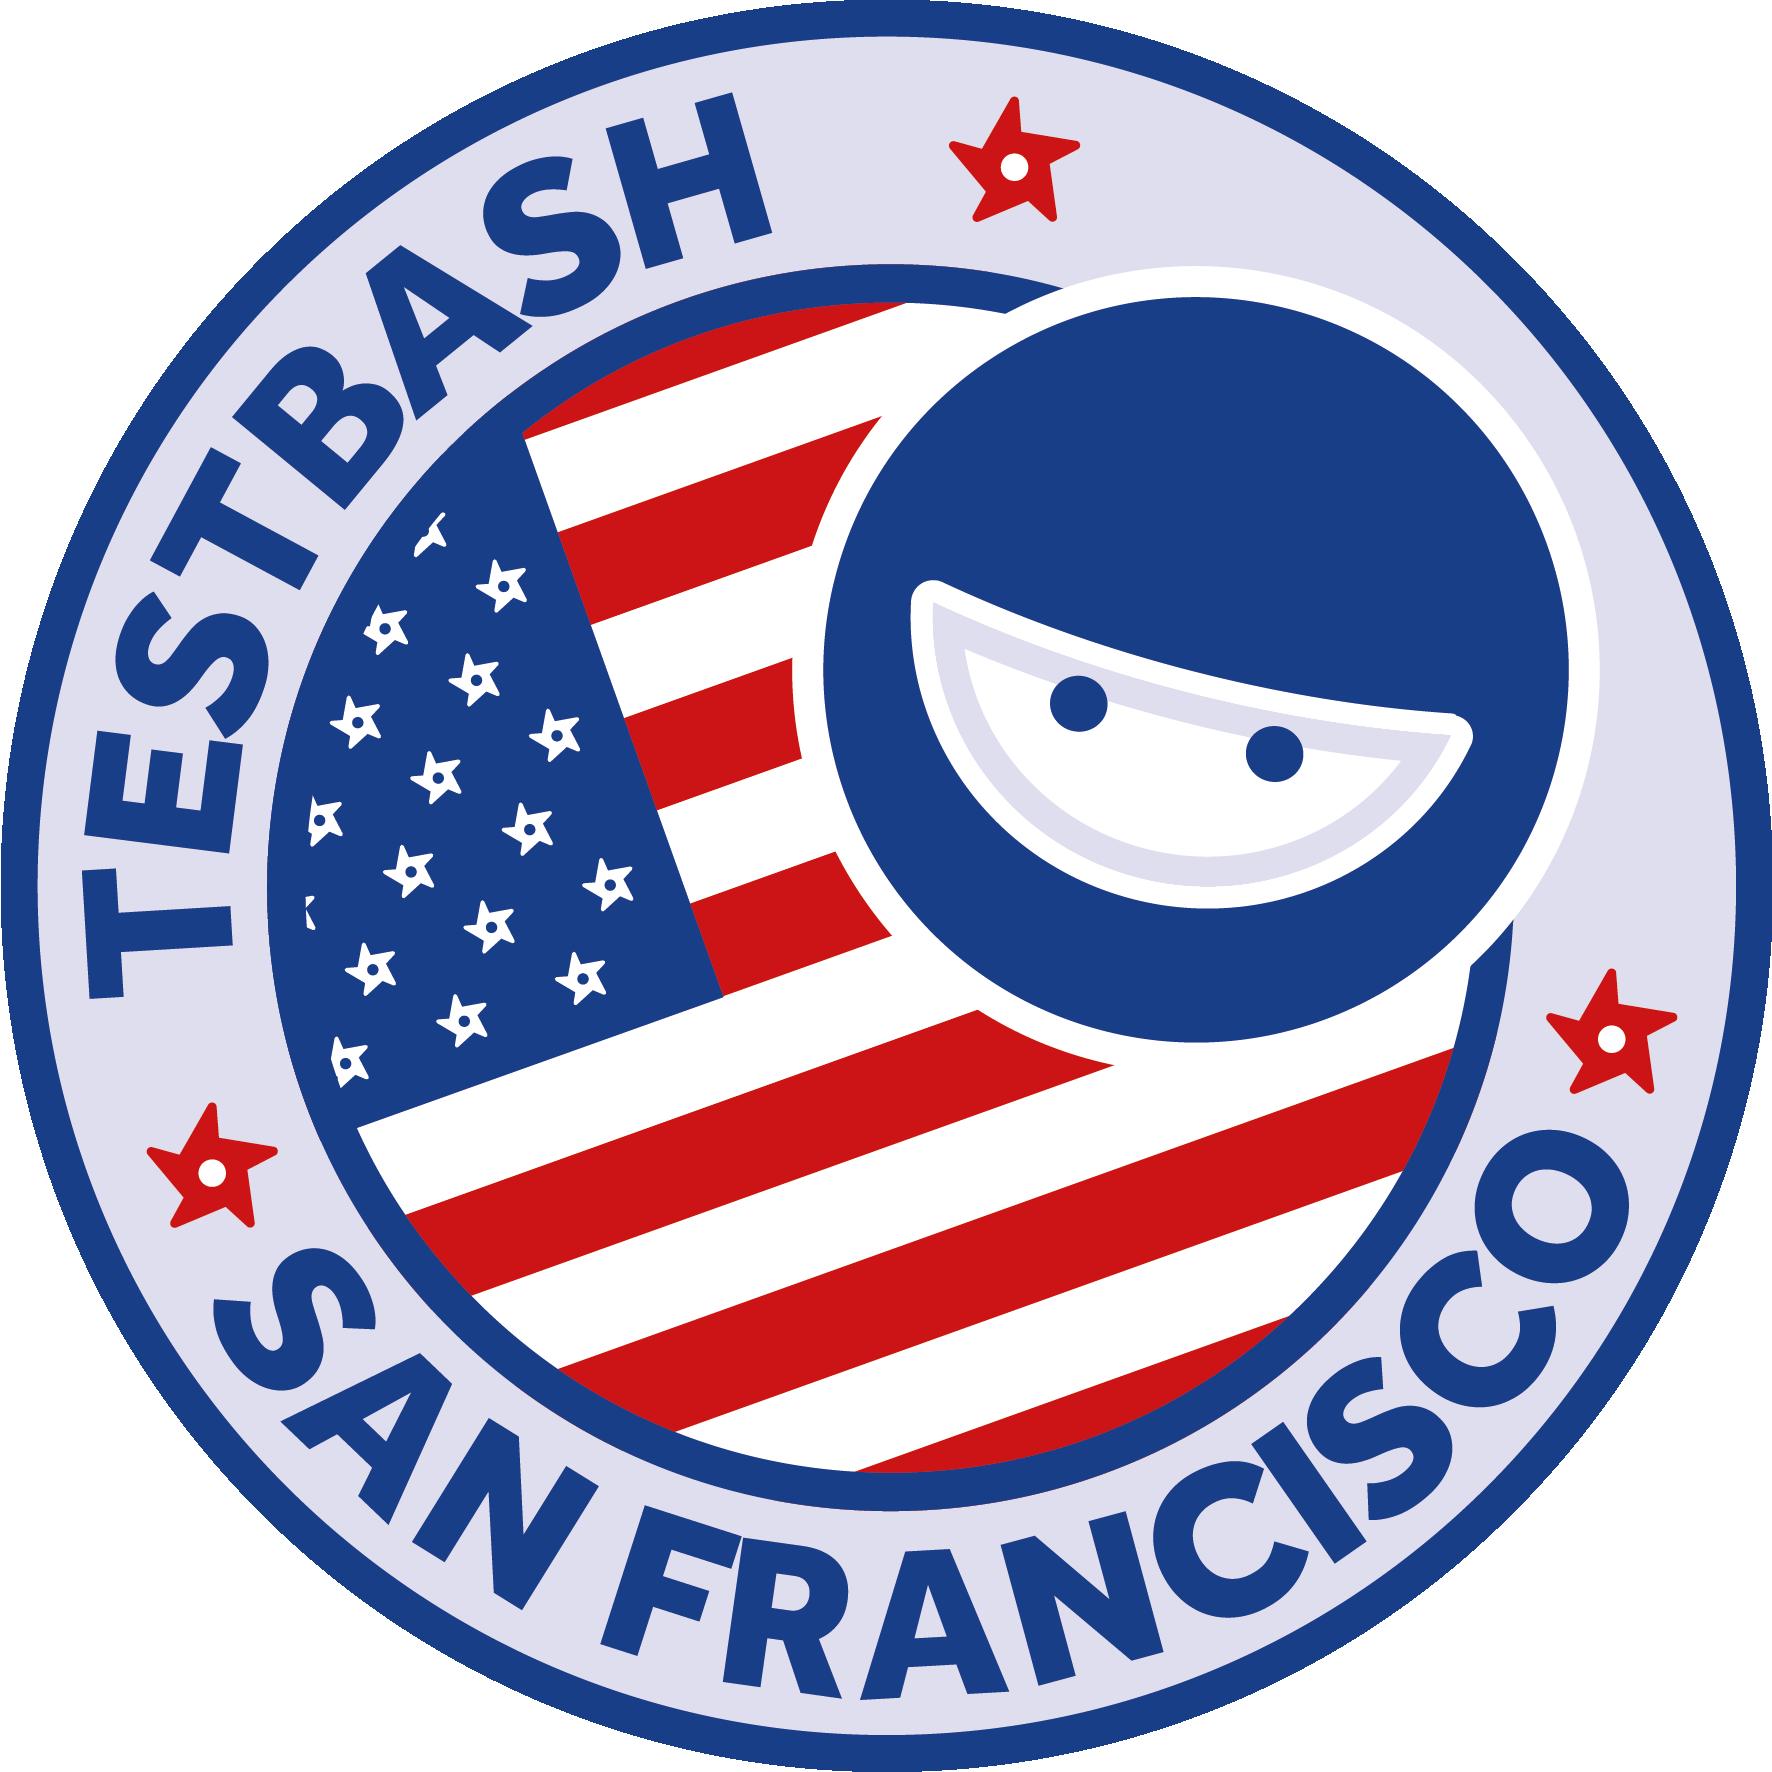 TestBash San Francisco 2019 logo